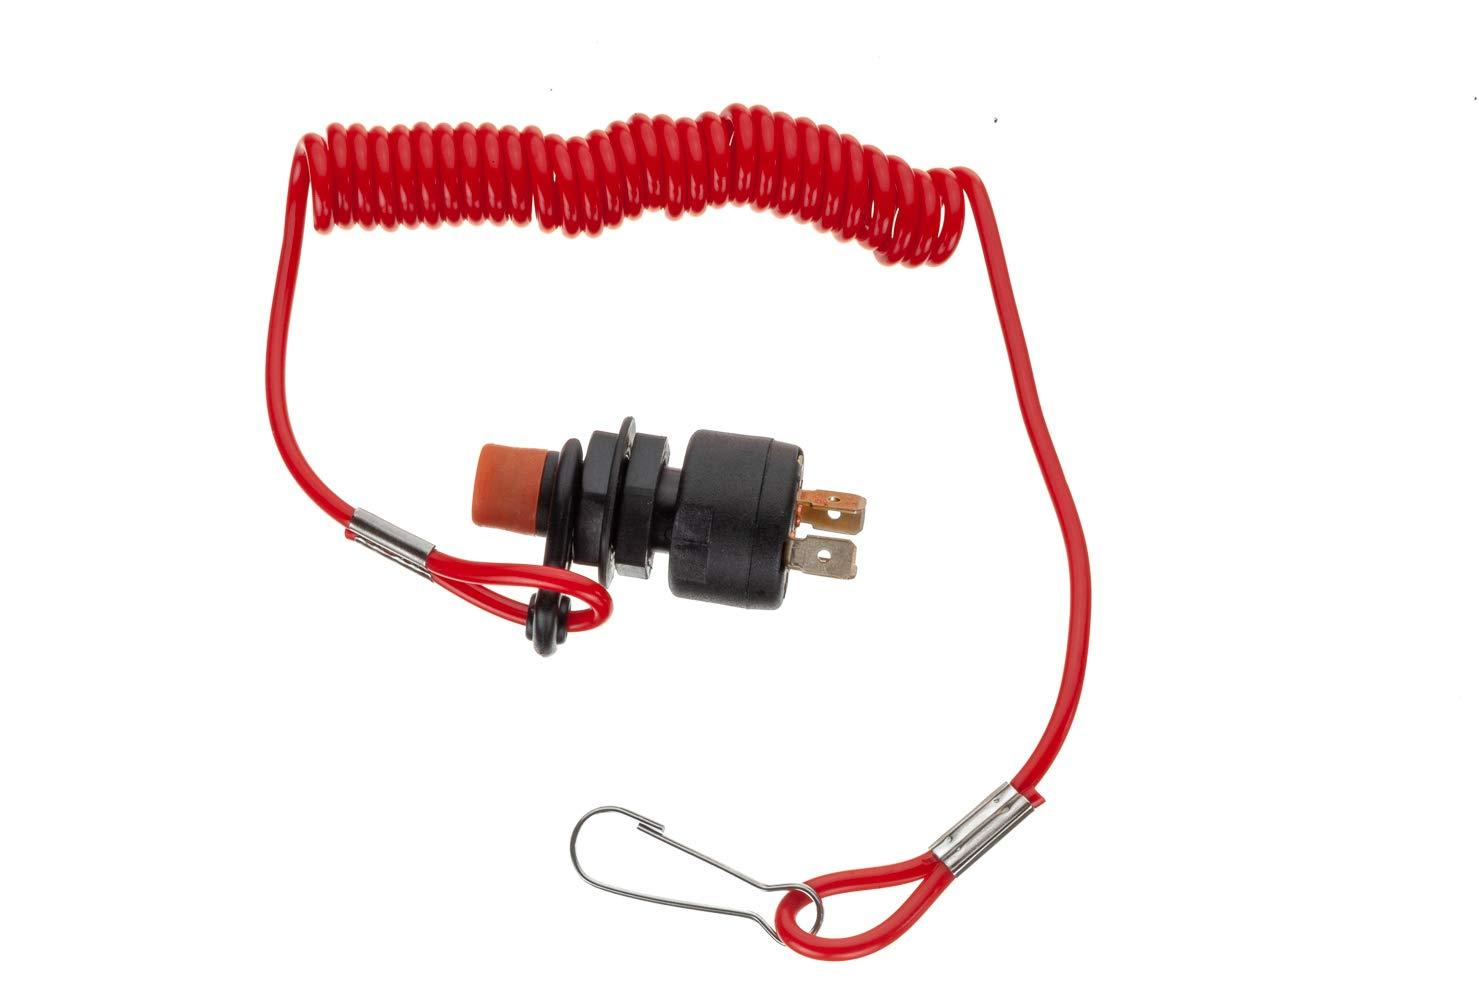 amazon com : seachoice seachoice 11681 universal kill switch kit : boating  equipment : sports & outdoors